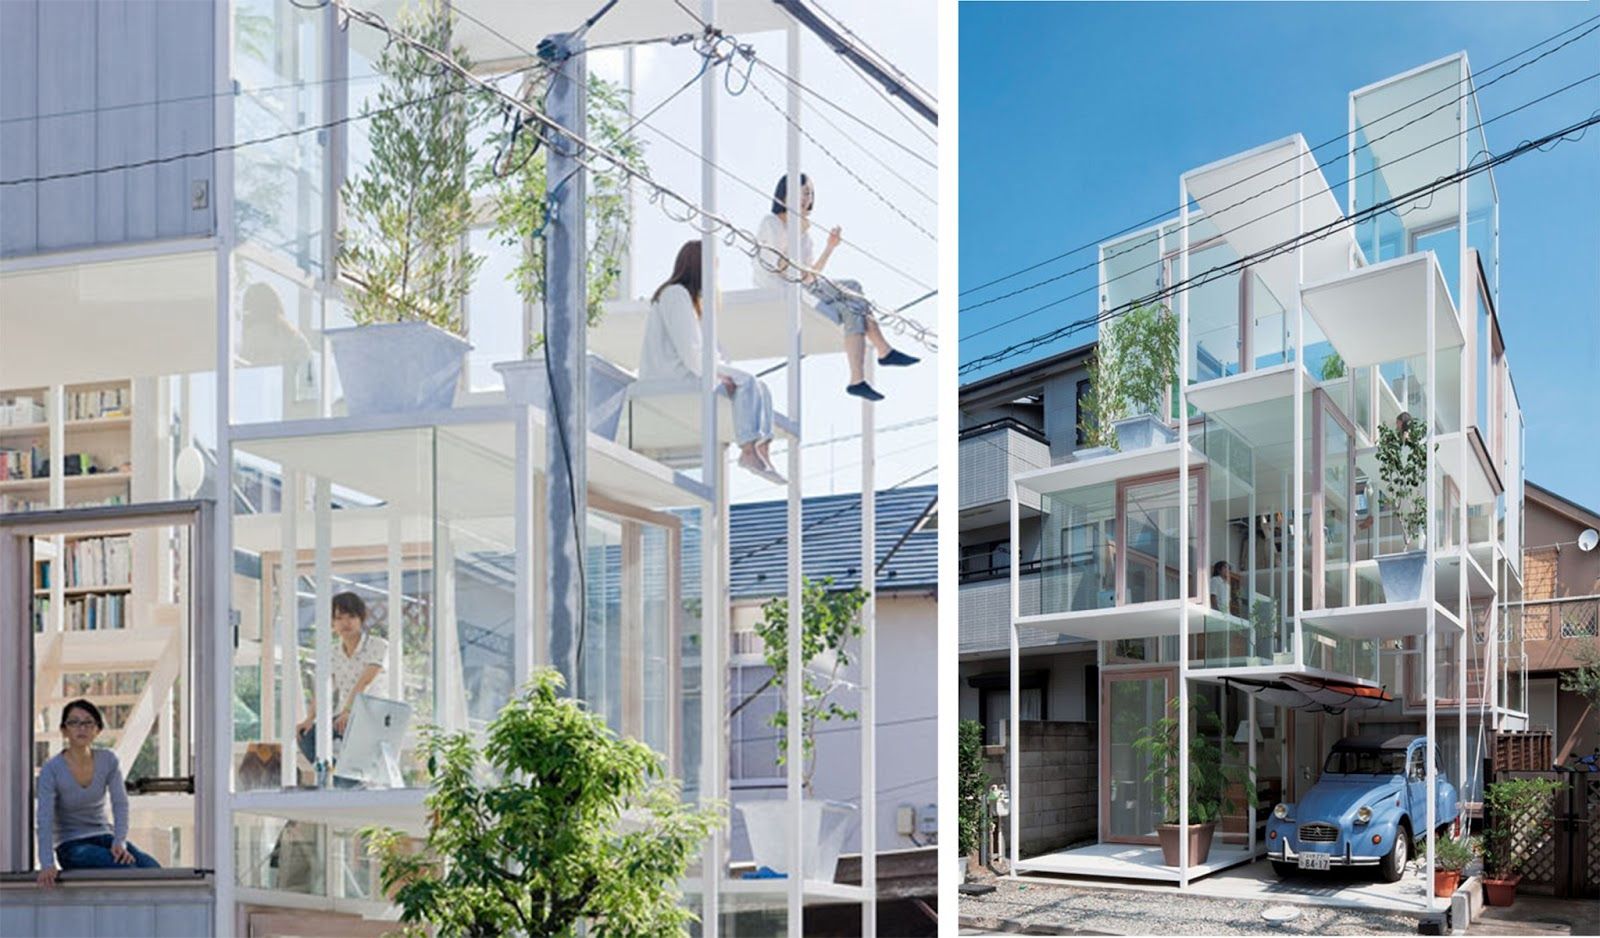 House NA in Tokyo, Japan by Sou Fujimoto